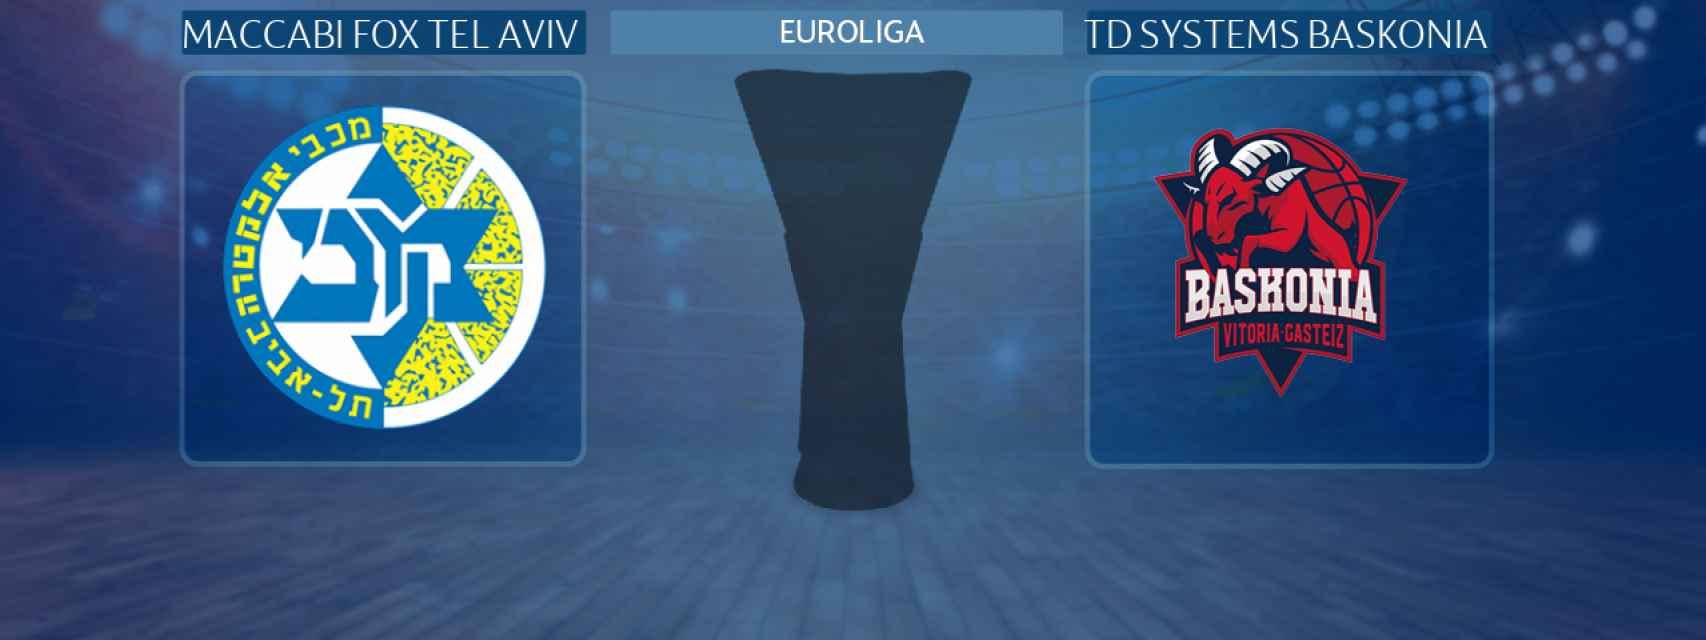 Maccabi Fox Tel Aviv - TD Systems Baskonia, partido de la Euroliga